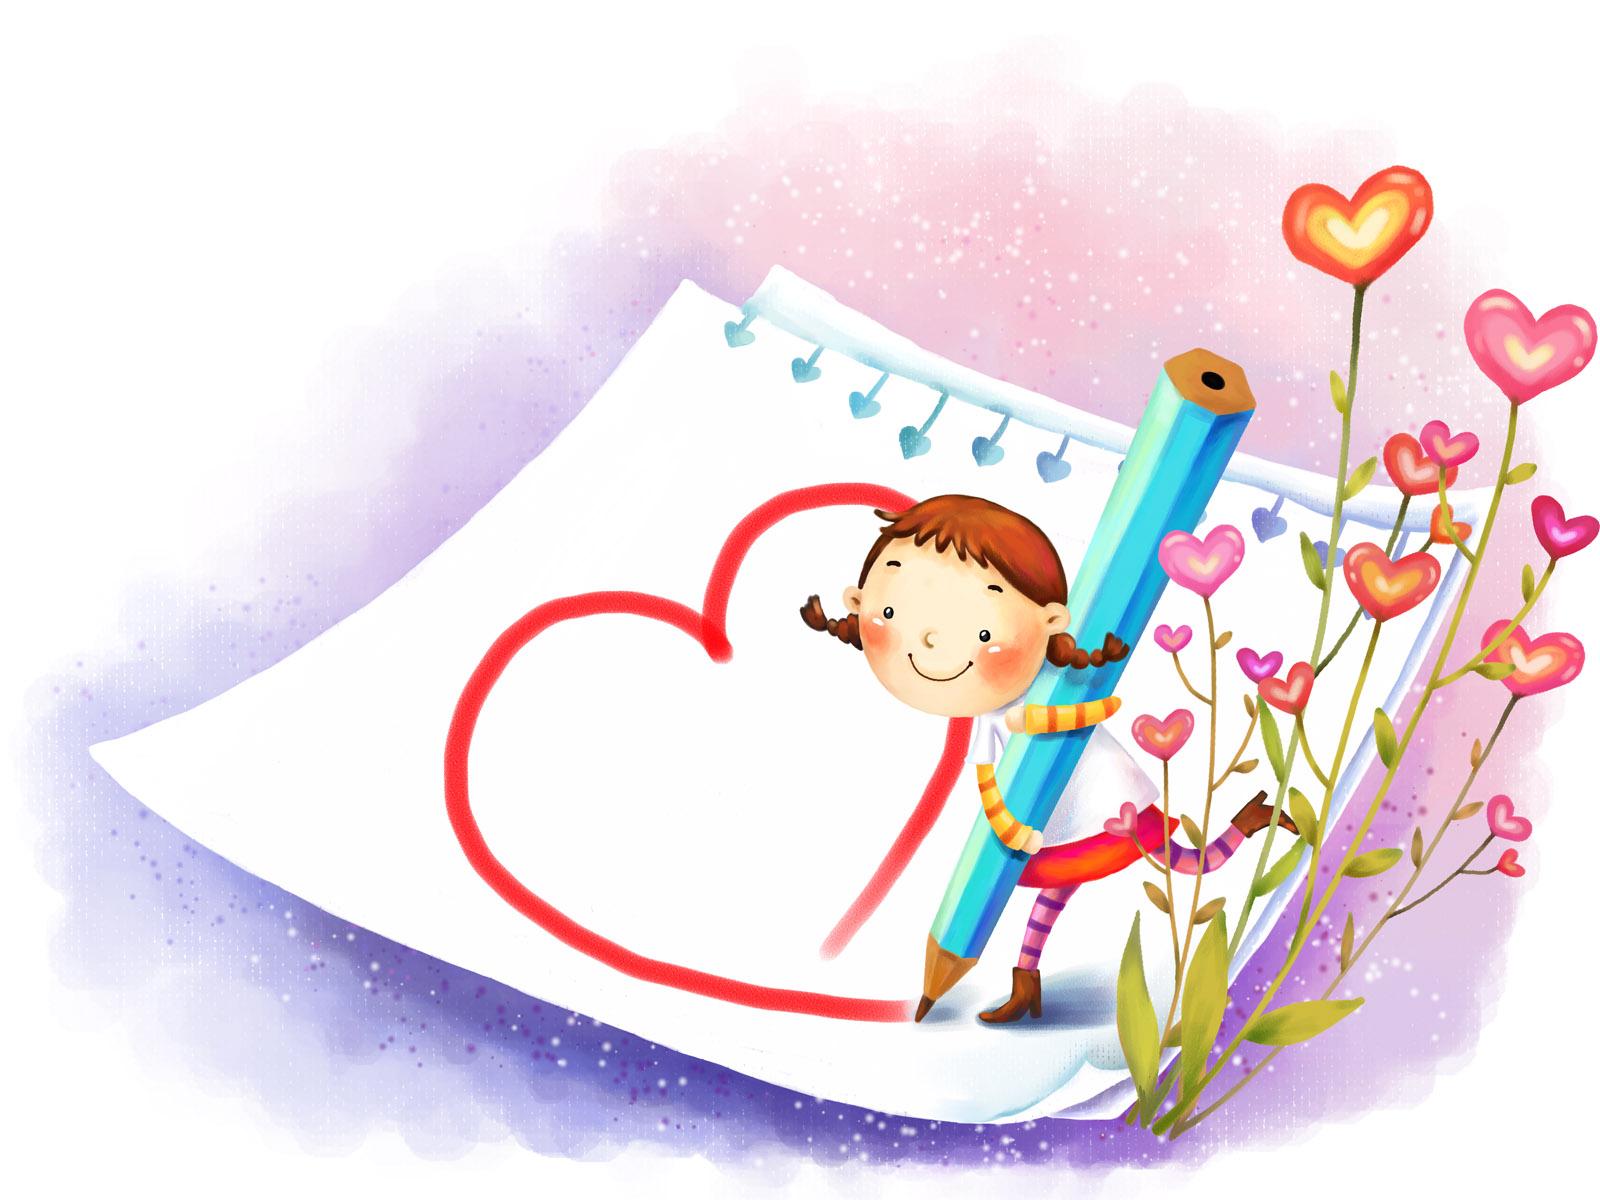 День святого валентина Защита нива шевроле своими